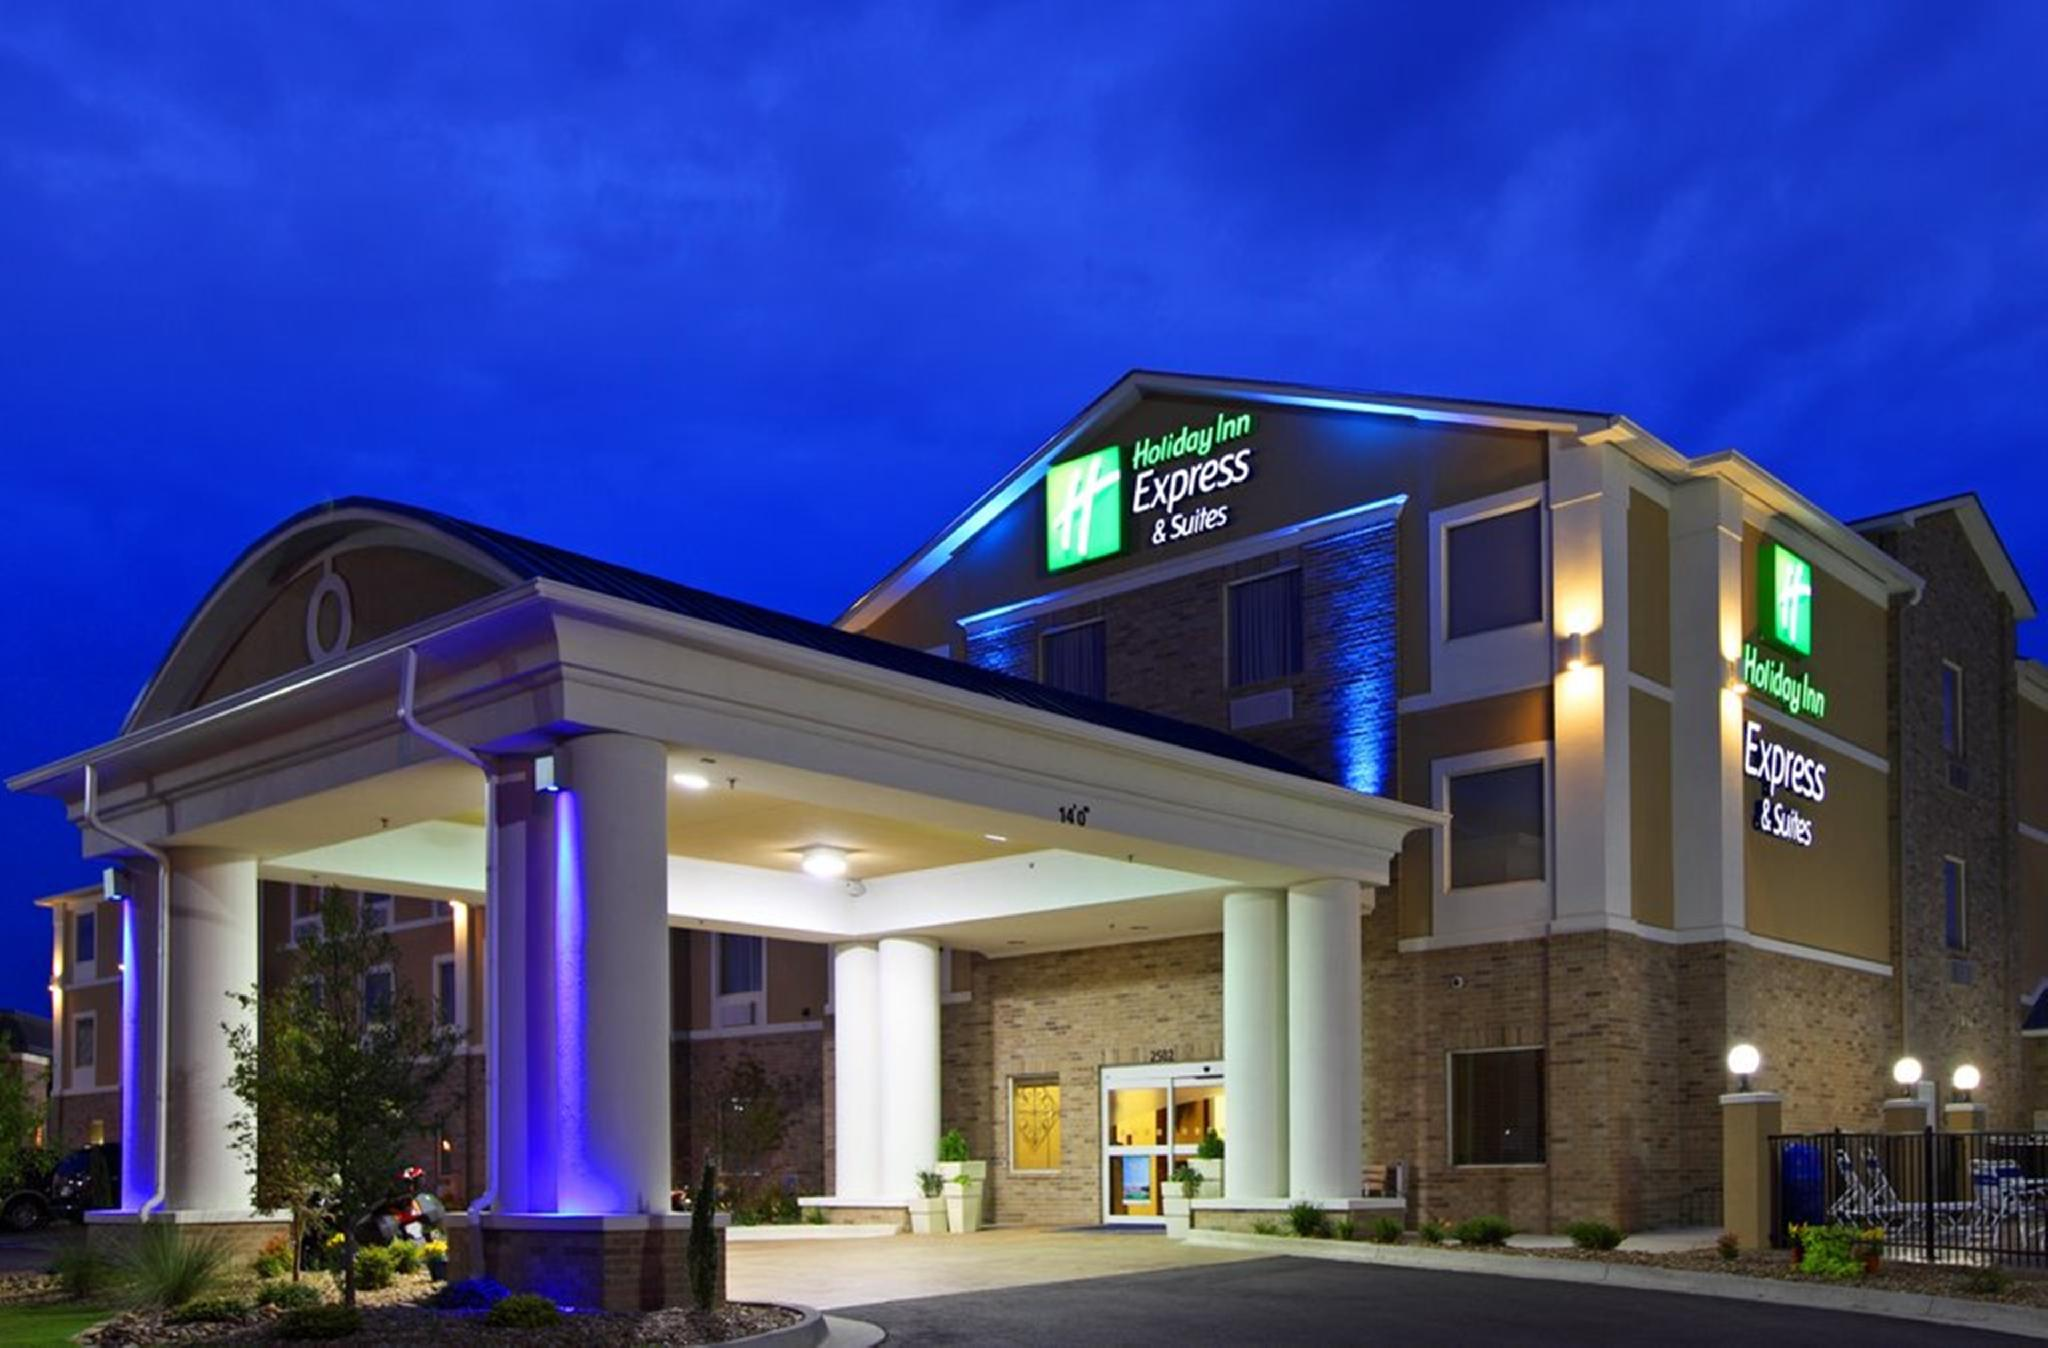 Holiday Inn Express & Suites Sandusky, Erie